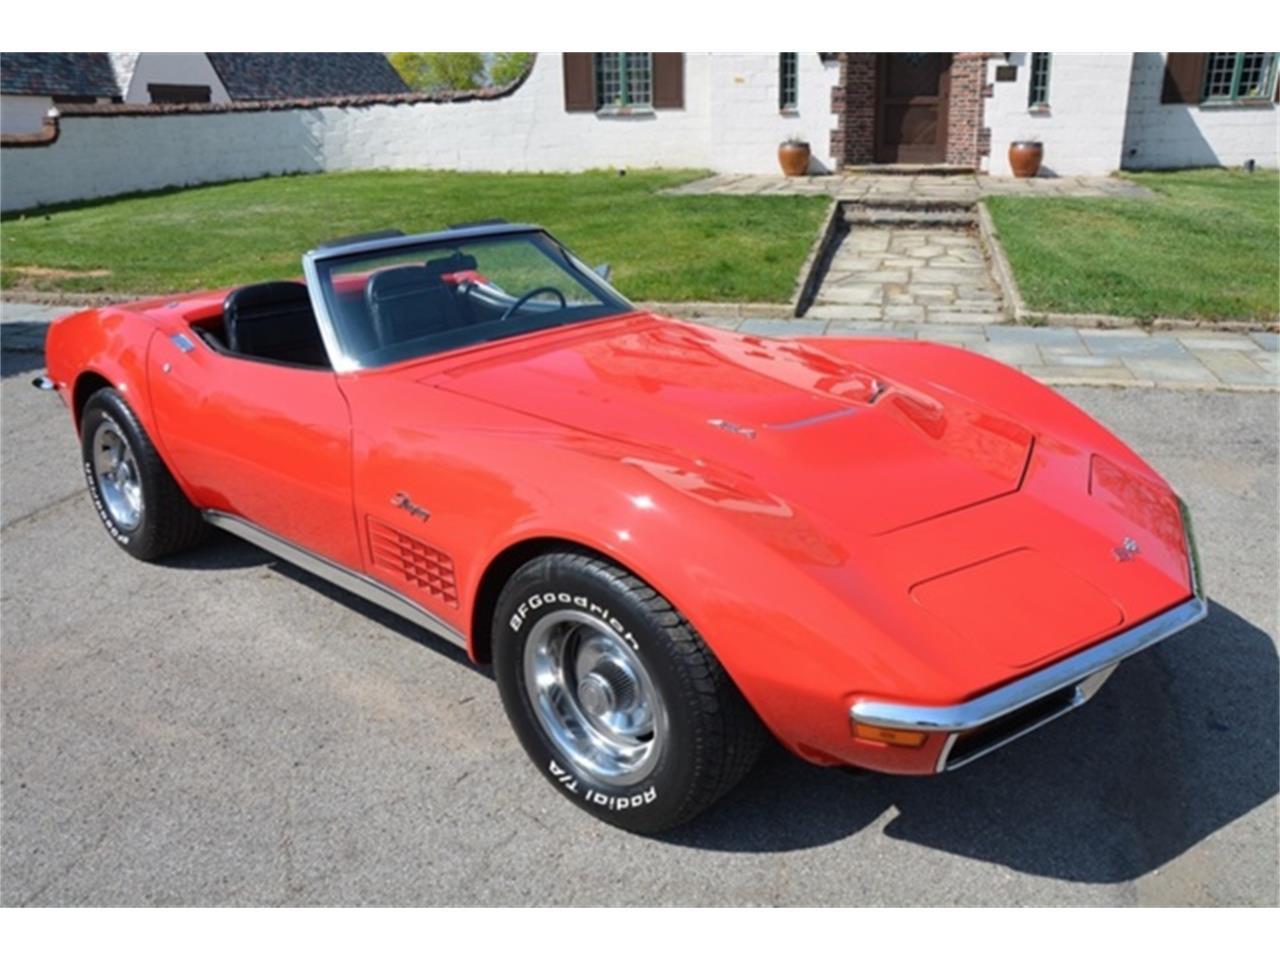 Large Picture of '72 Corvette located in Michigan - $39,995.00 - LAFE